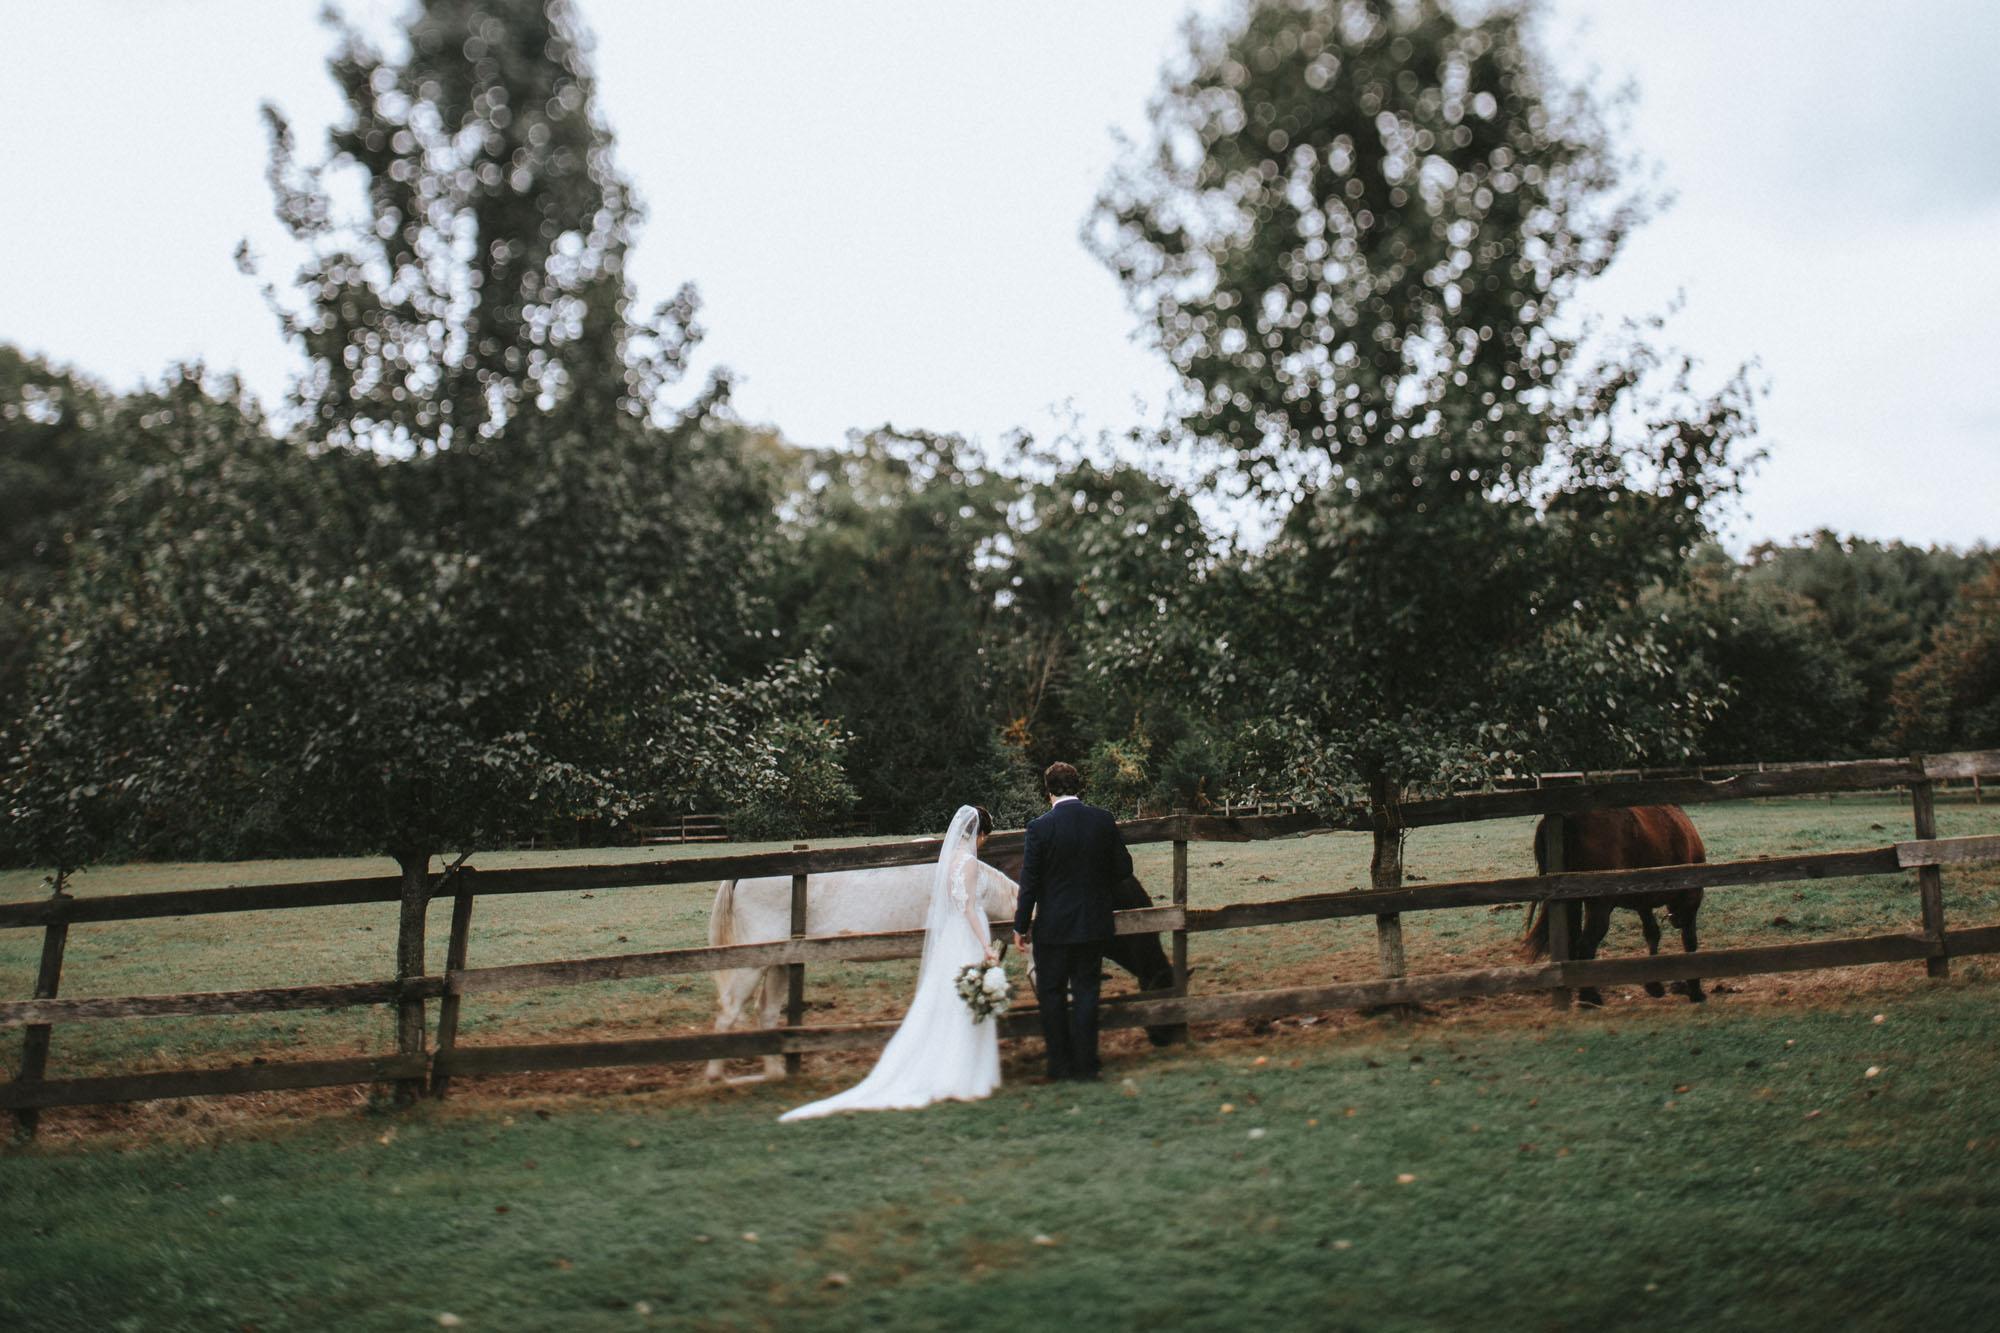 Twisted-Oaks-Studio-Arianne-Sean-Wedding-189.jpg